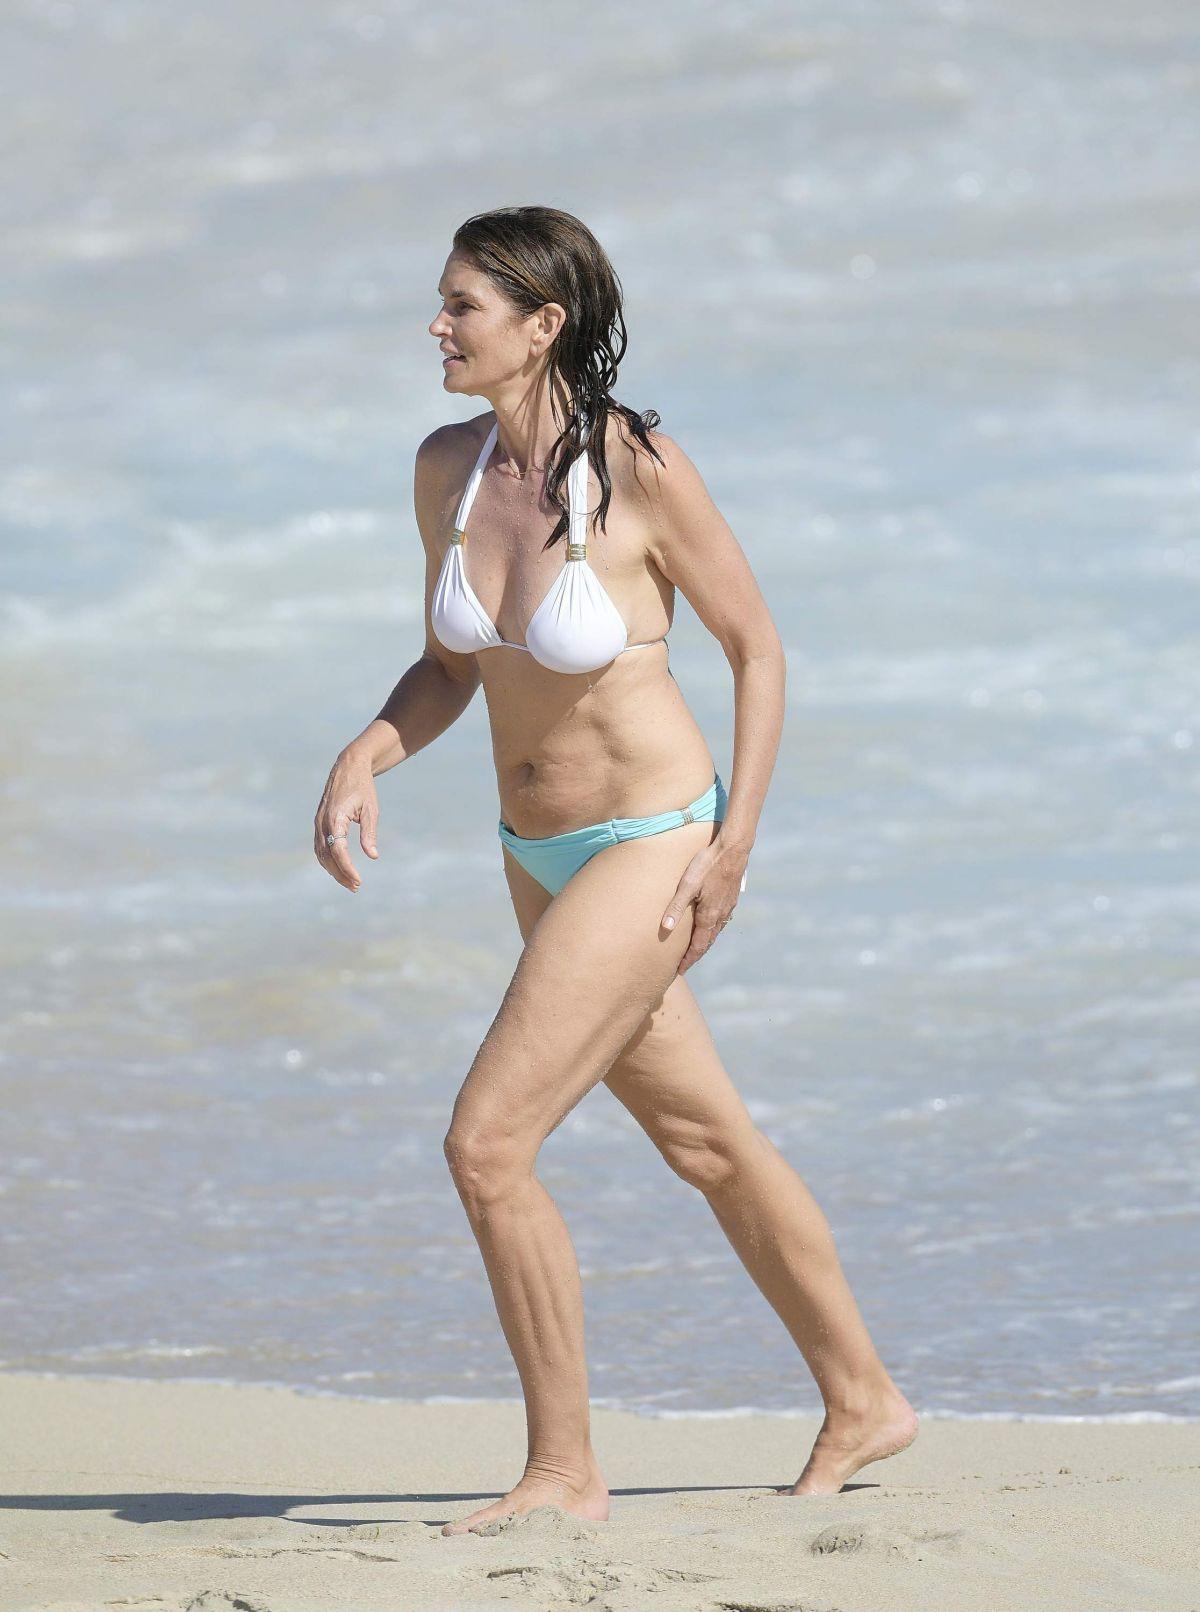 Cindy crawford in bikini at the beach pics 679